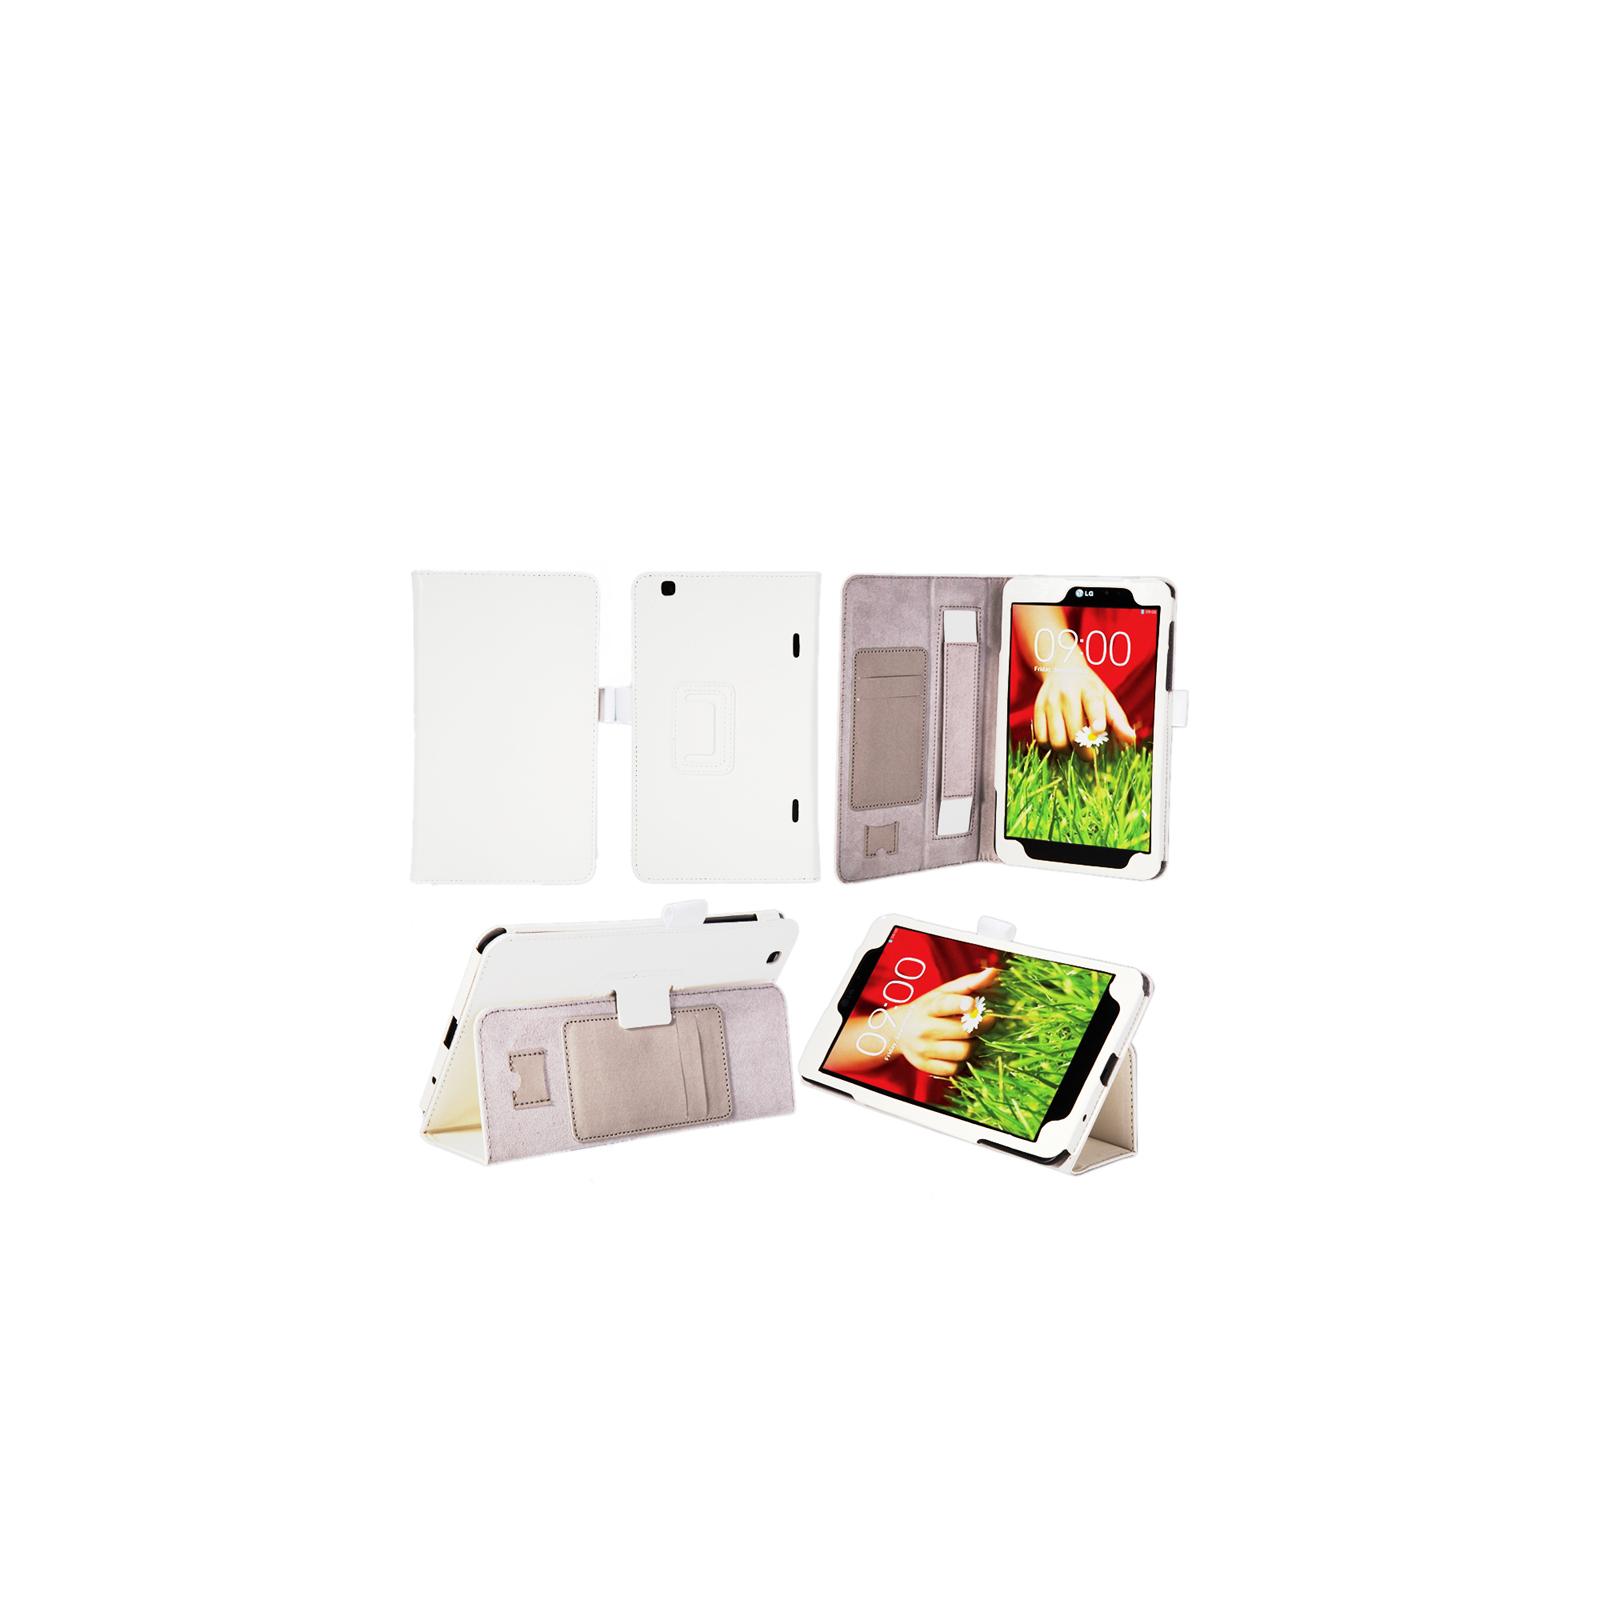 Чехол для планшета AirOn для LG G Pad 8.3 white (6946795850113) изображение 8